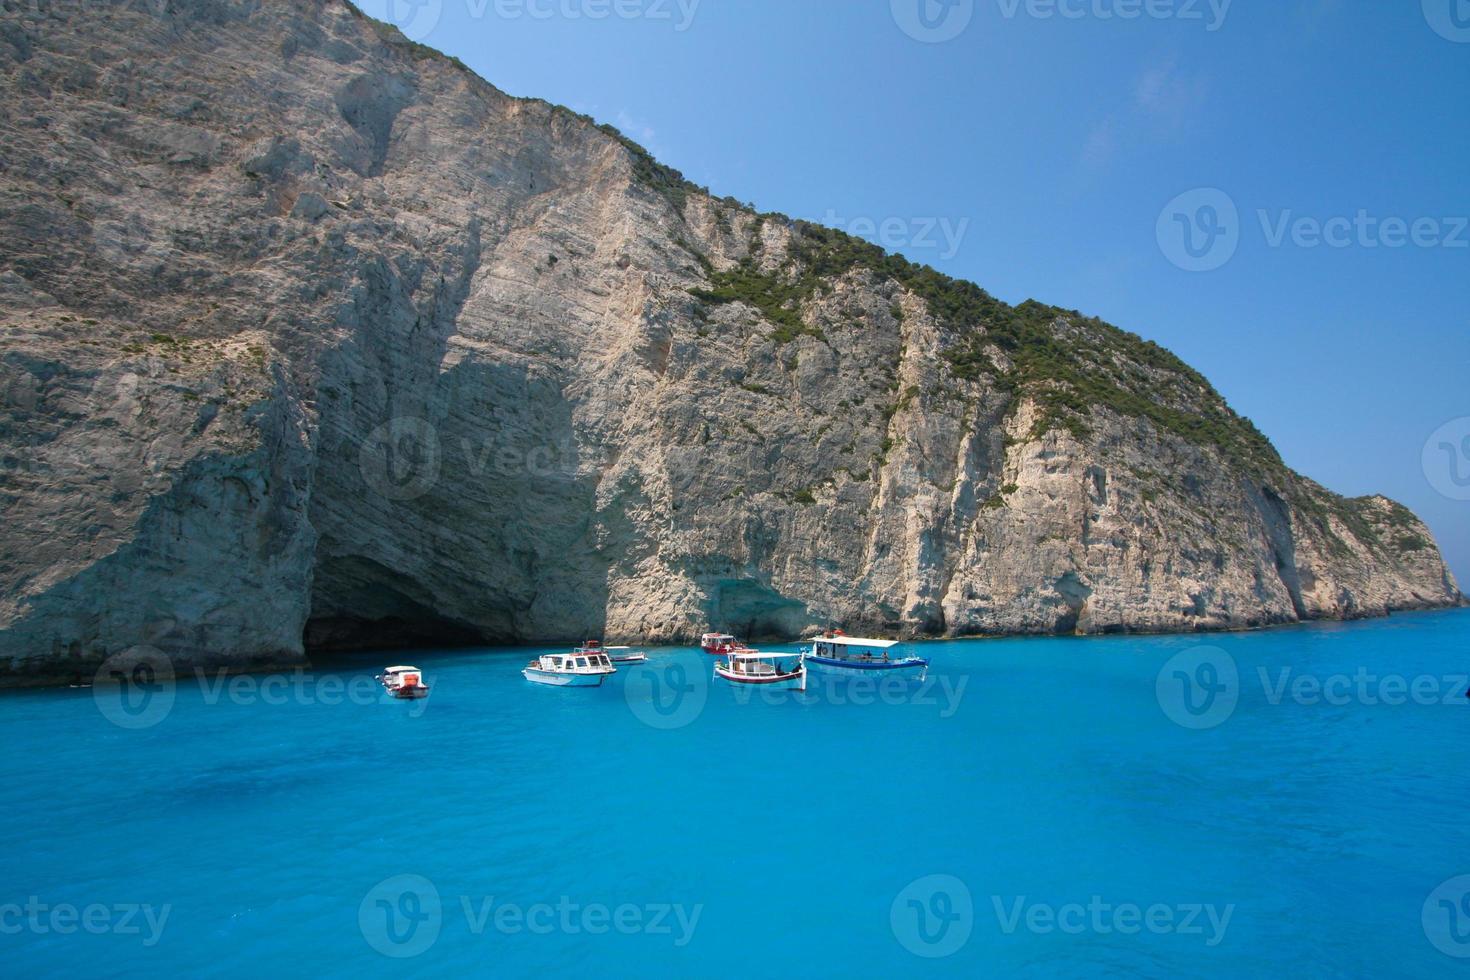 baía navagio - barcos na água azul foto